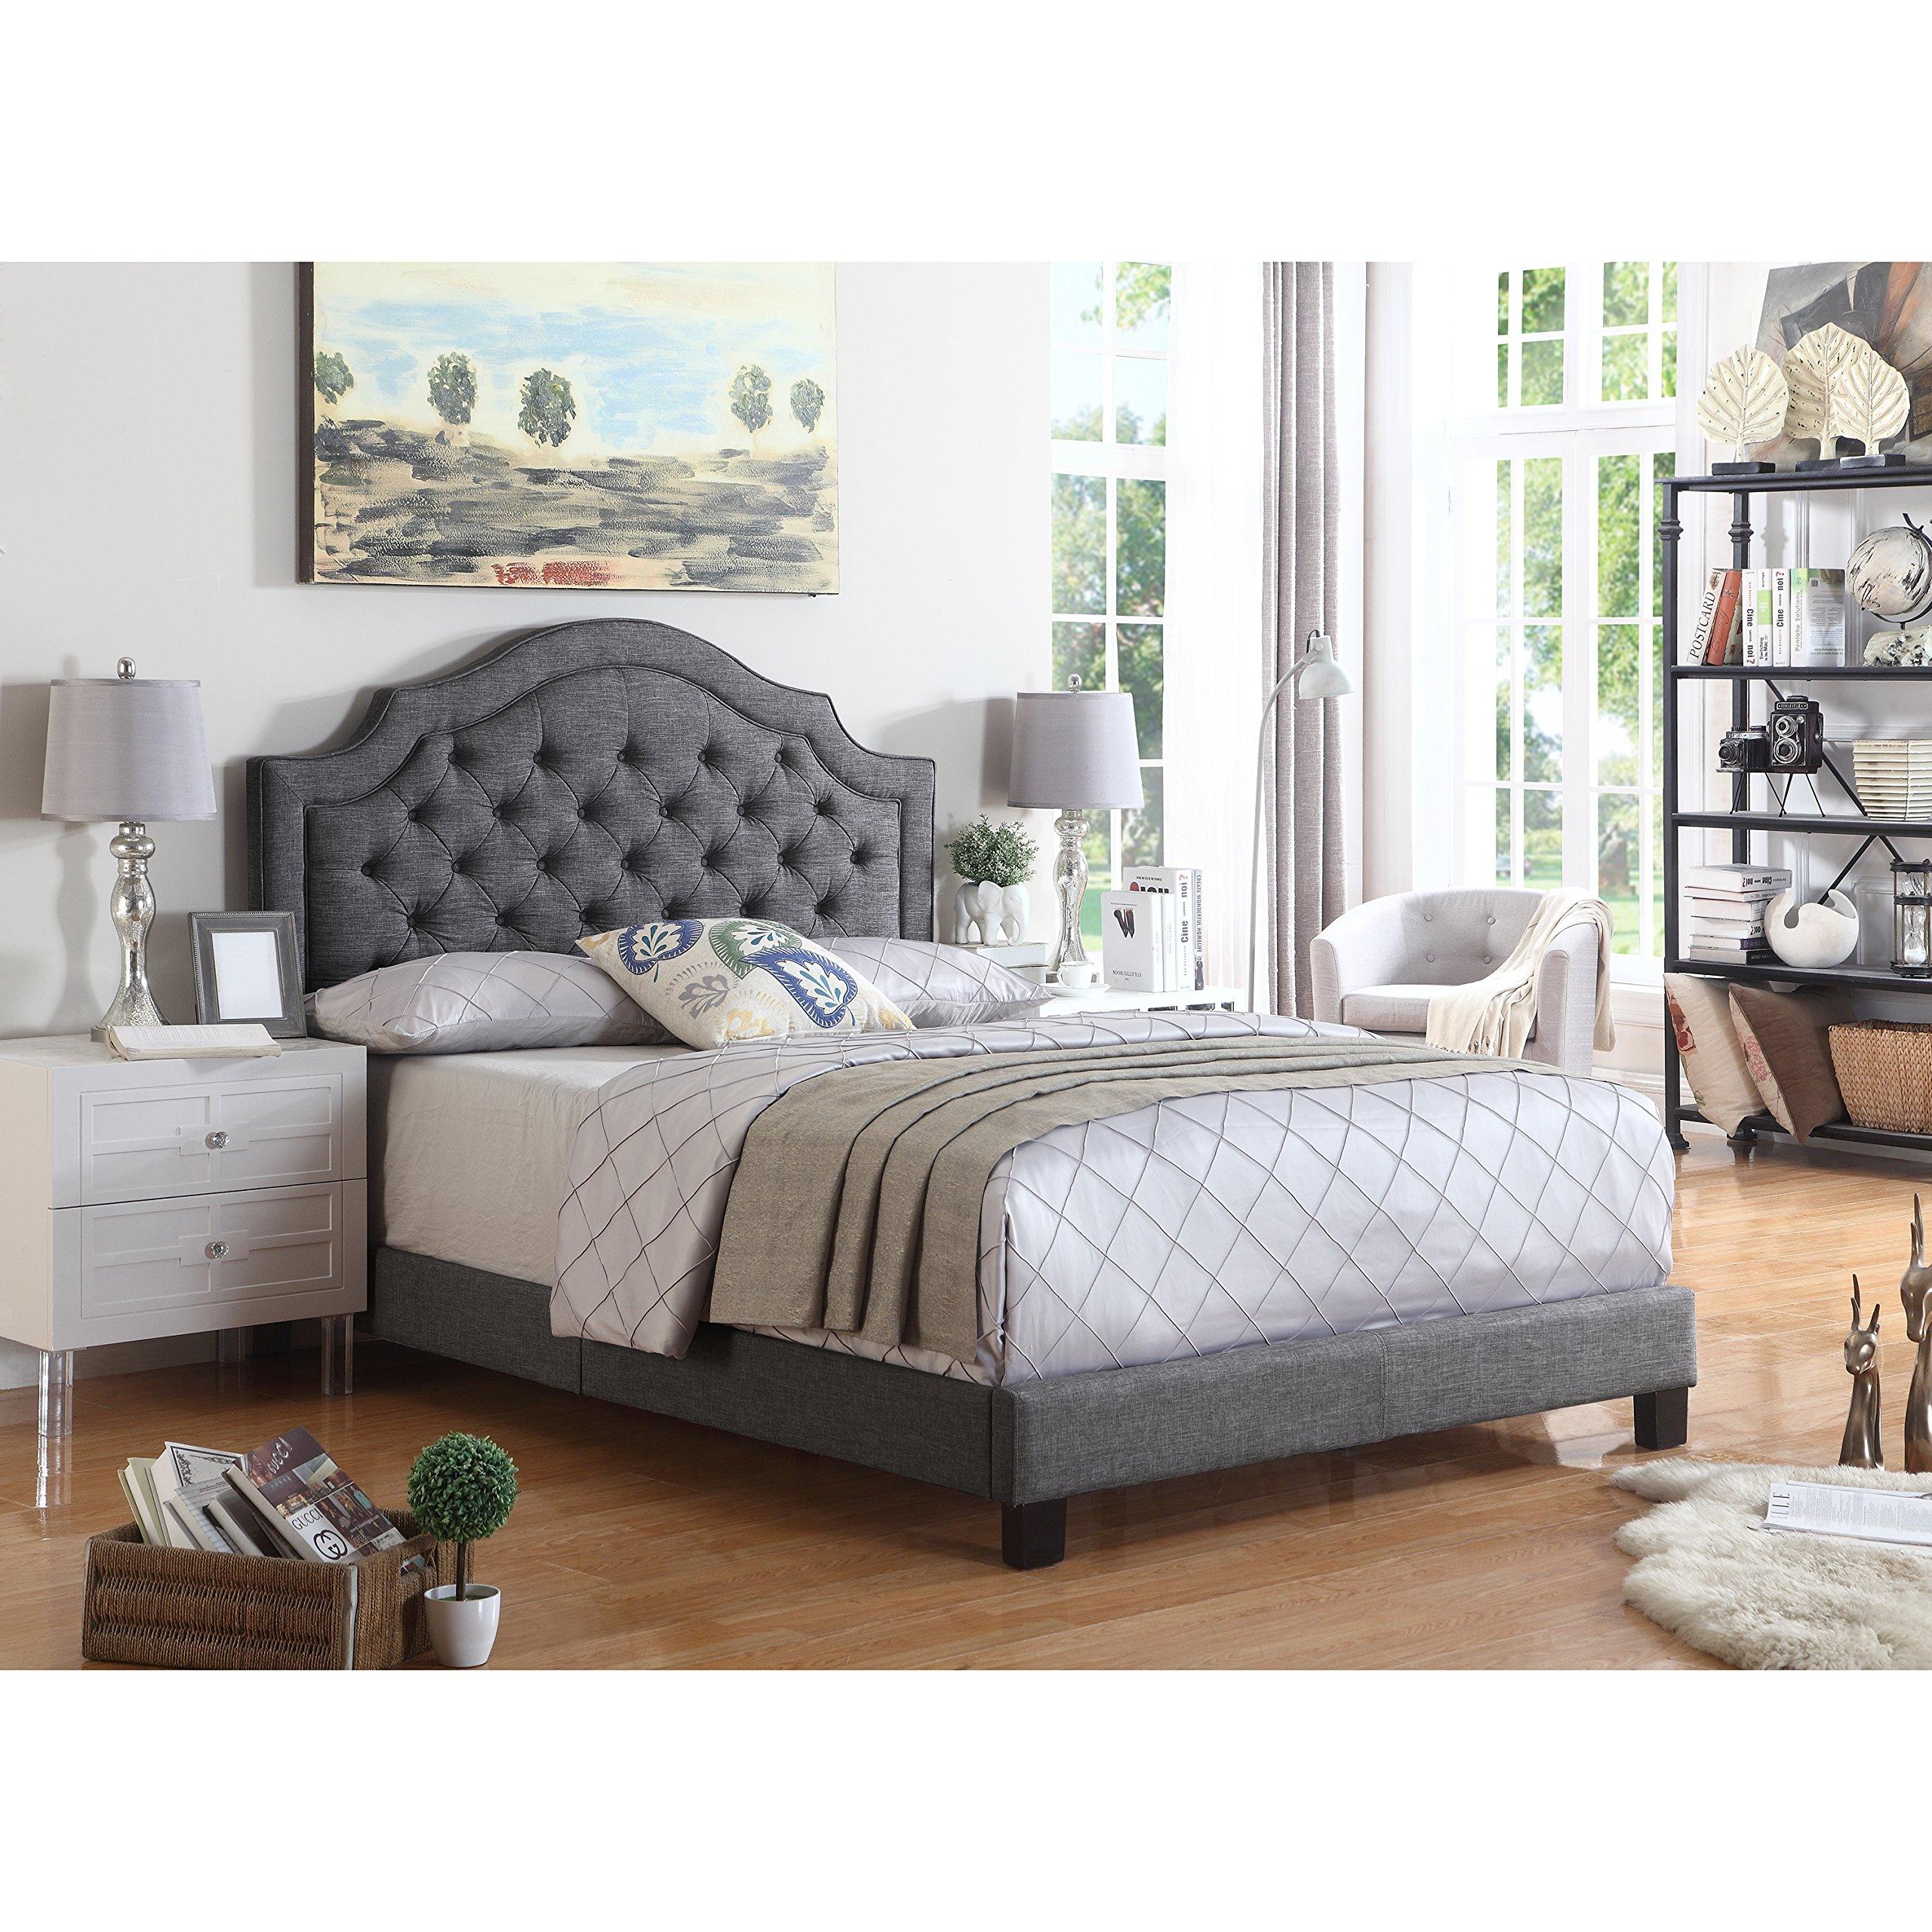 Rosevera B4-3Q-00 Angelo Platform Bed, Queen, Grey by Rosevera